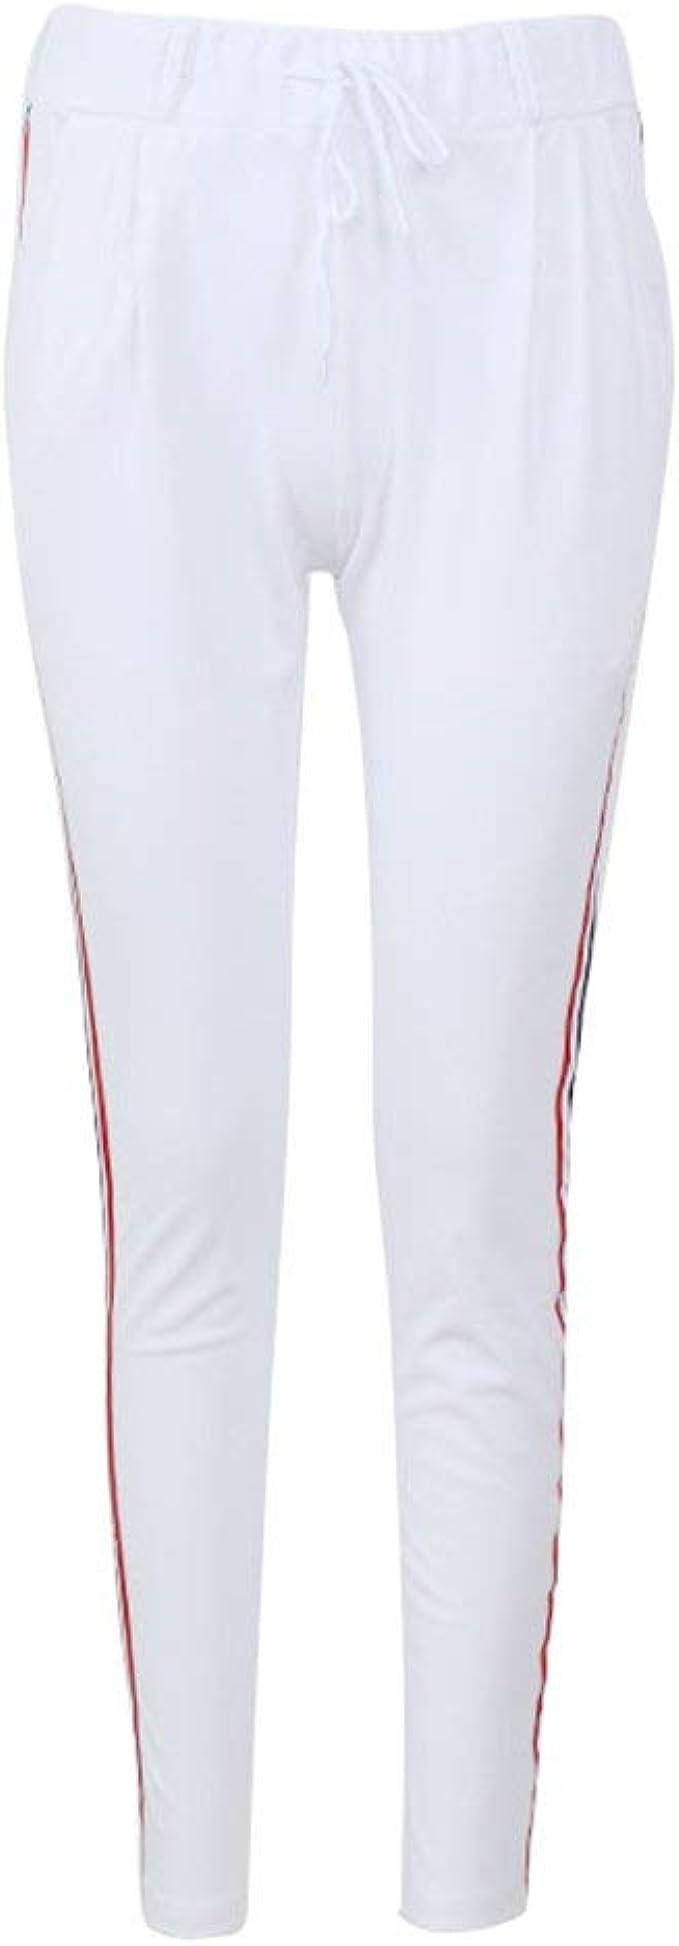 Pantalones De Chándal De Pantalones Jersey De Mujer Pantalones De ...